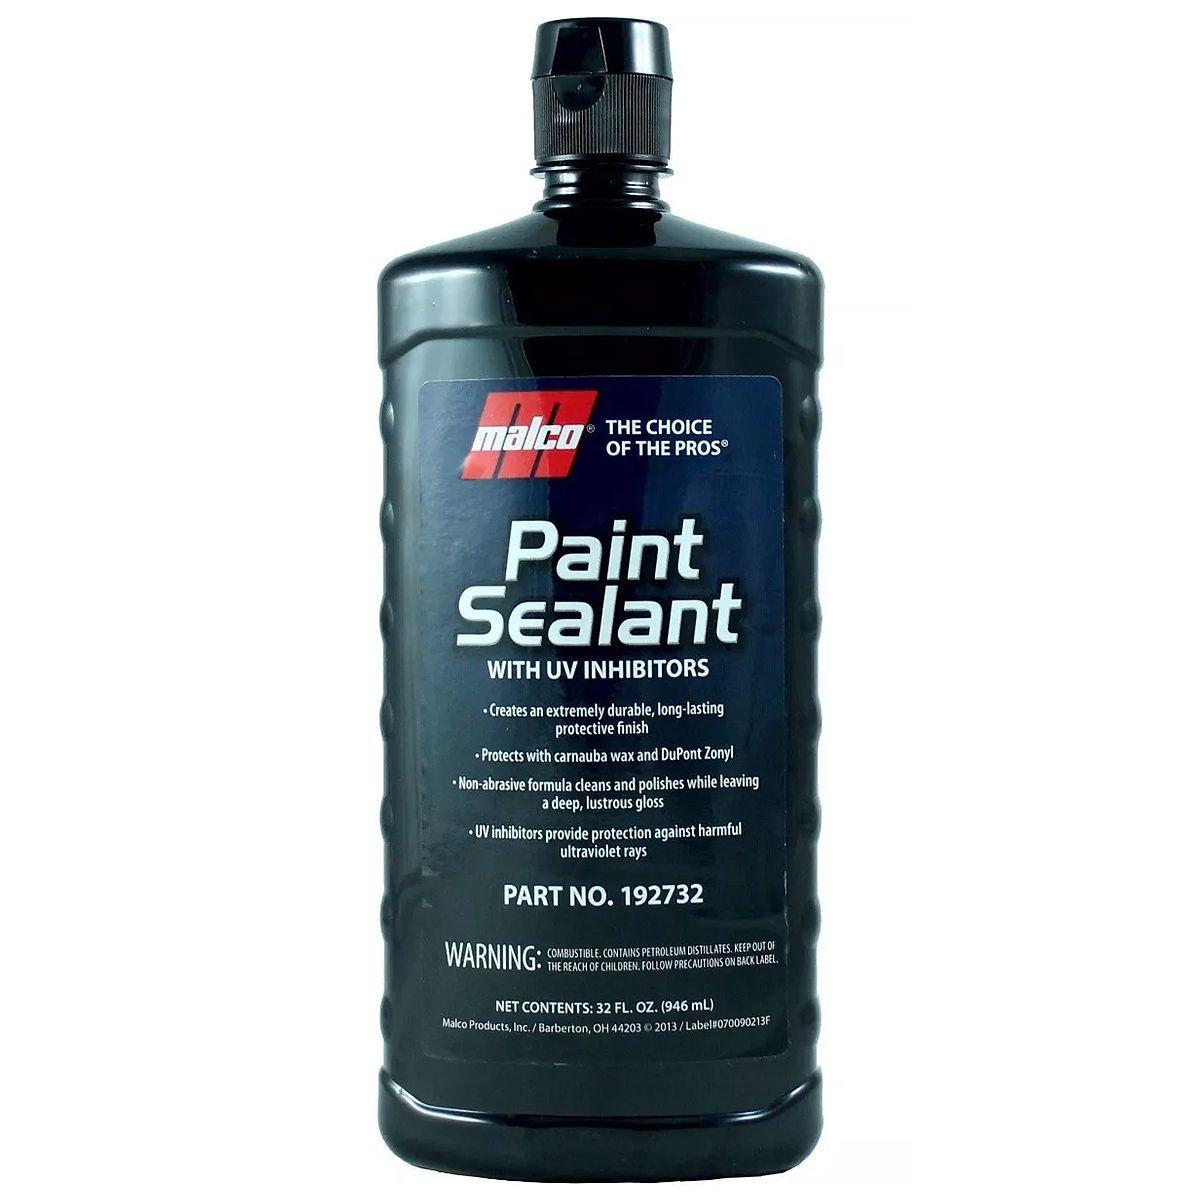 Selante de Pintura Malco Paint Sealant Malco 946ml